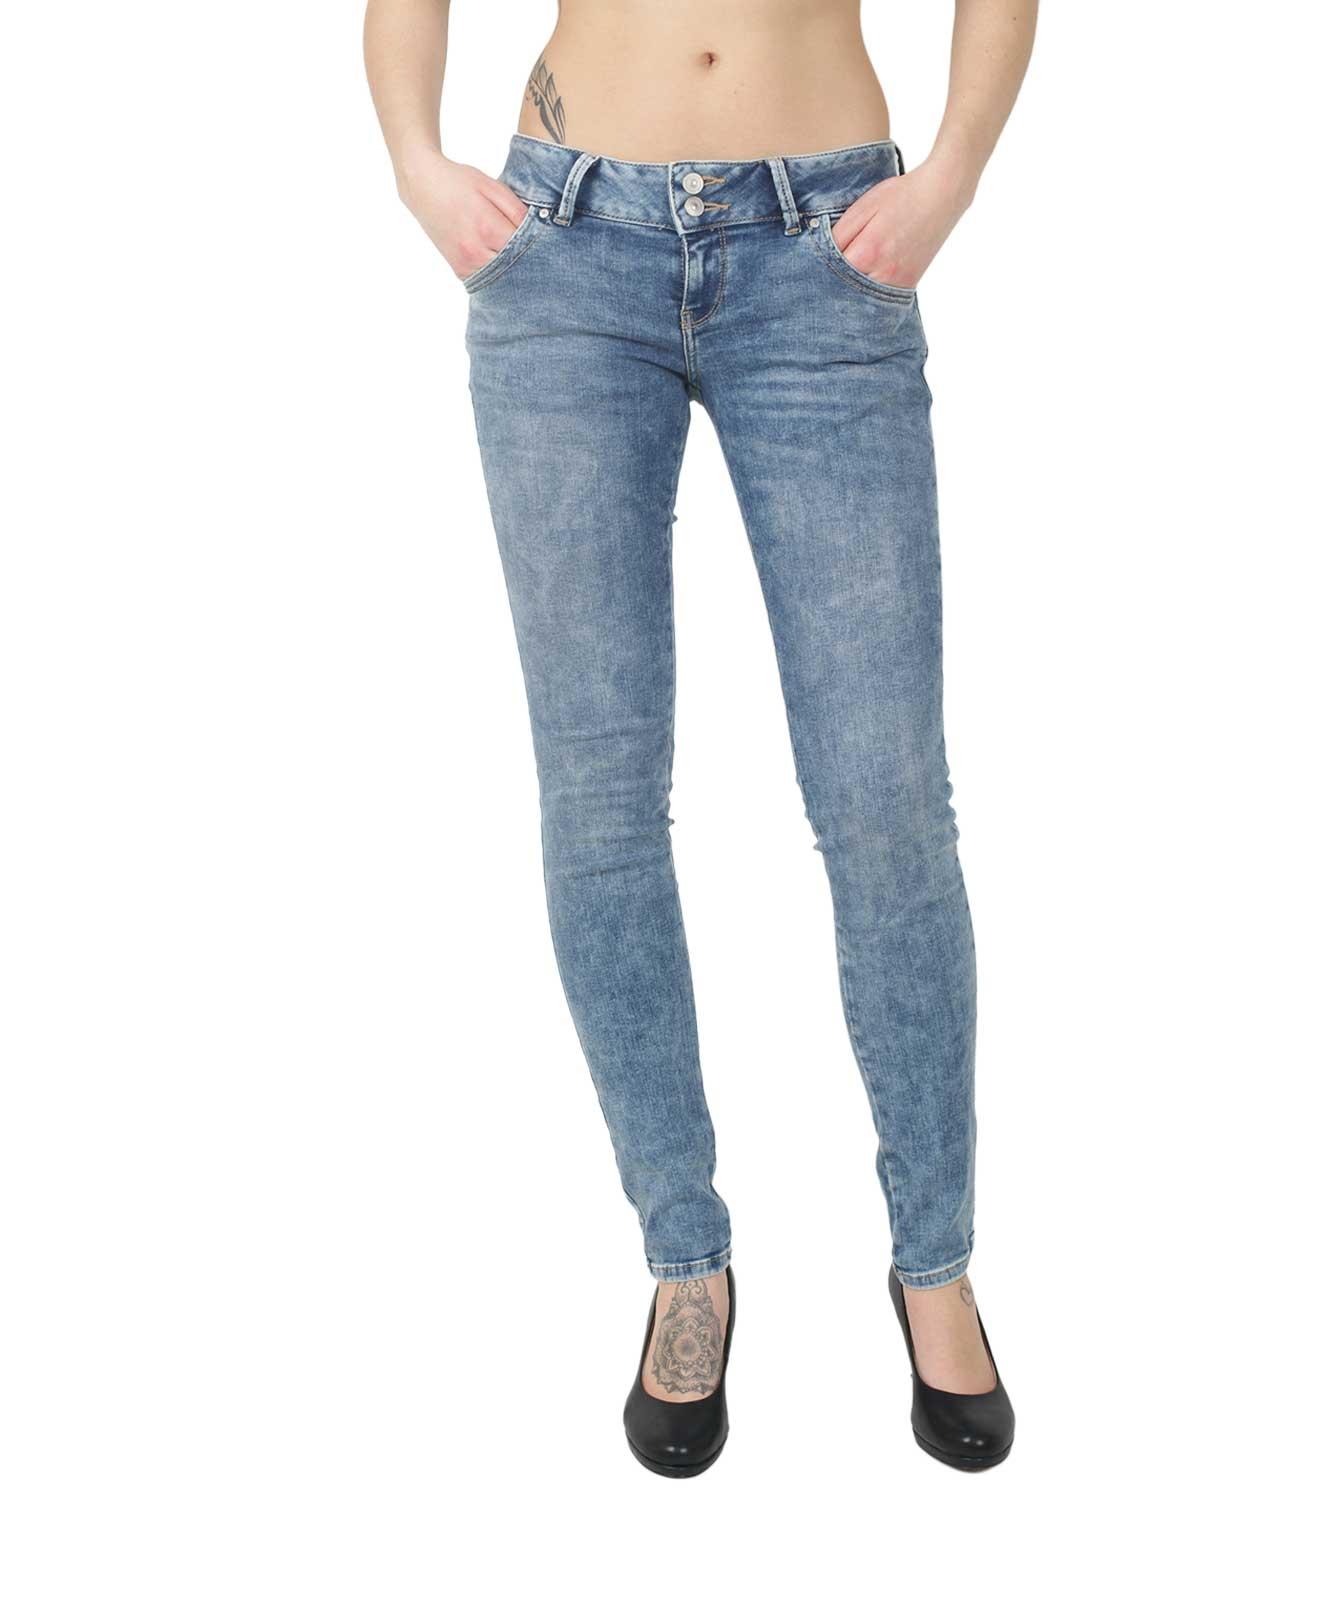 Hosen - LTB Jeans Röhre Molly in Etu Wash  - Onlineshop Jeans Meile